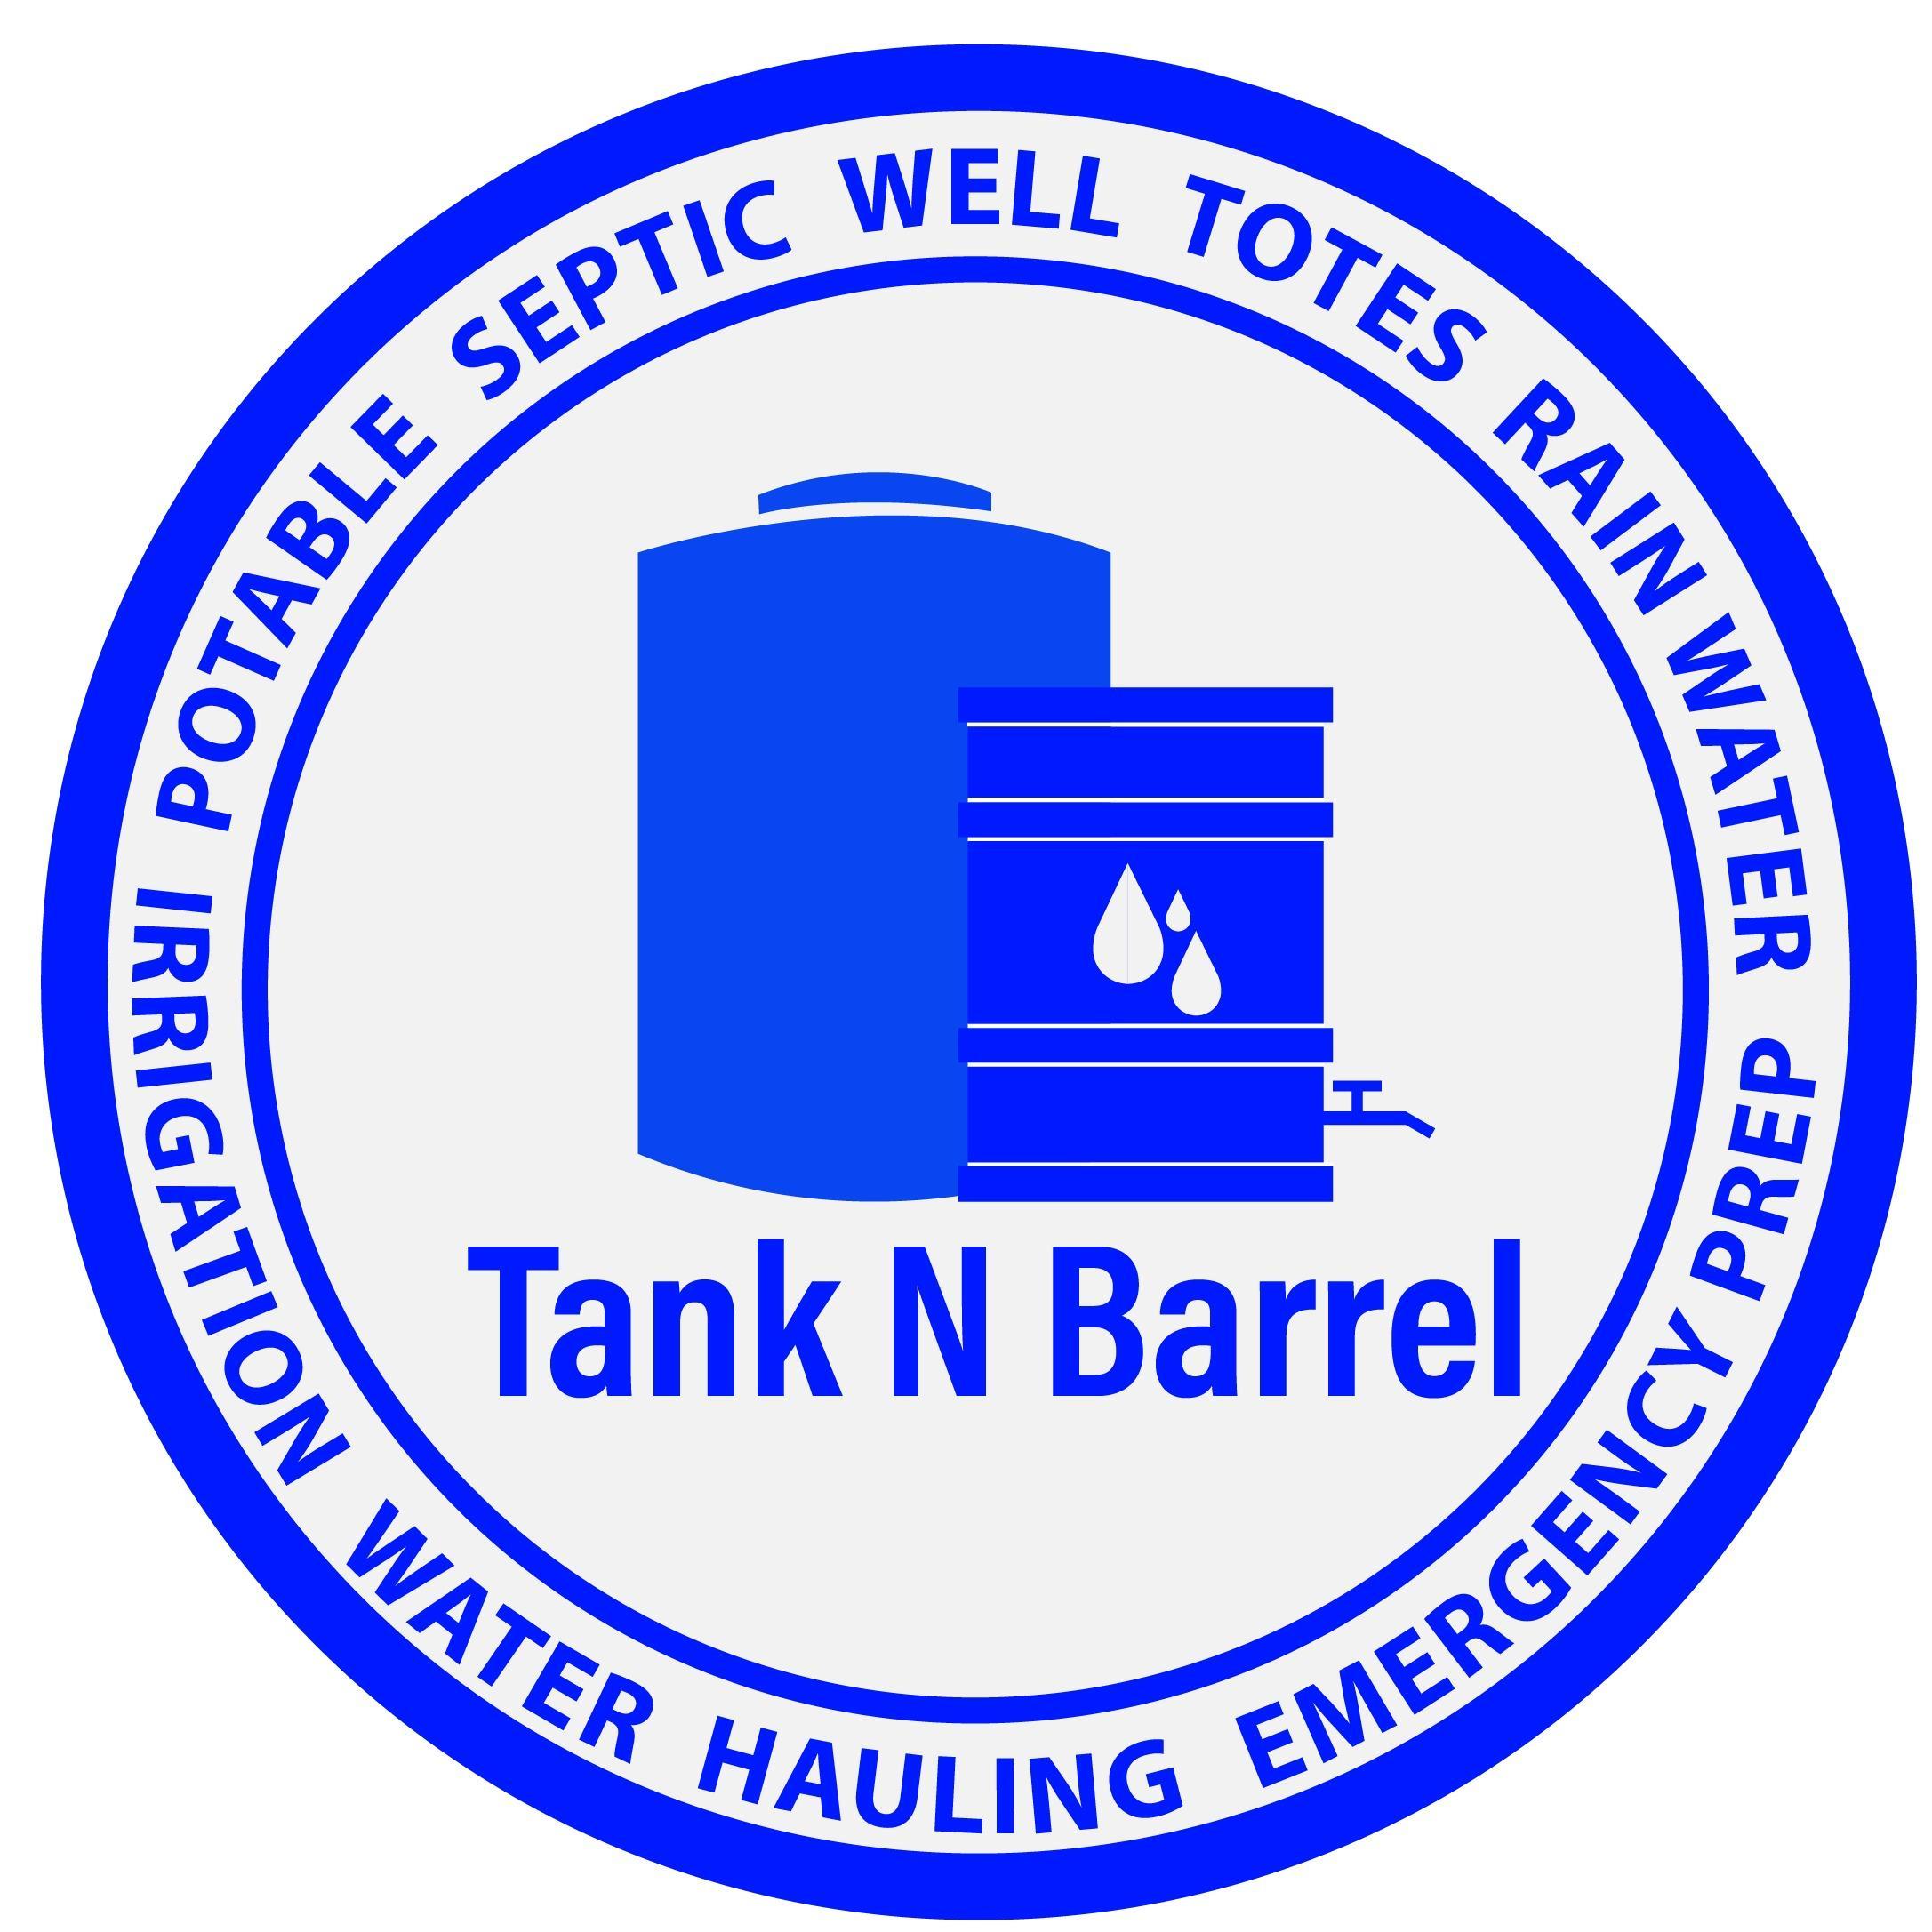 Tank N Barrel